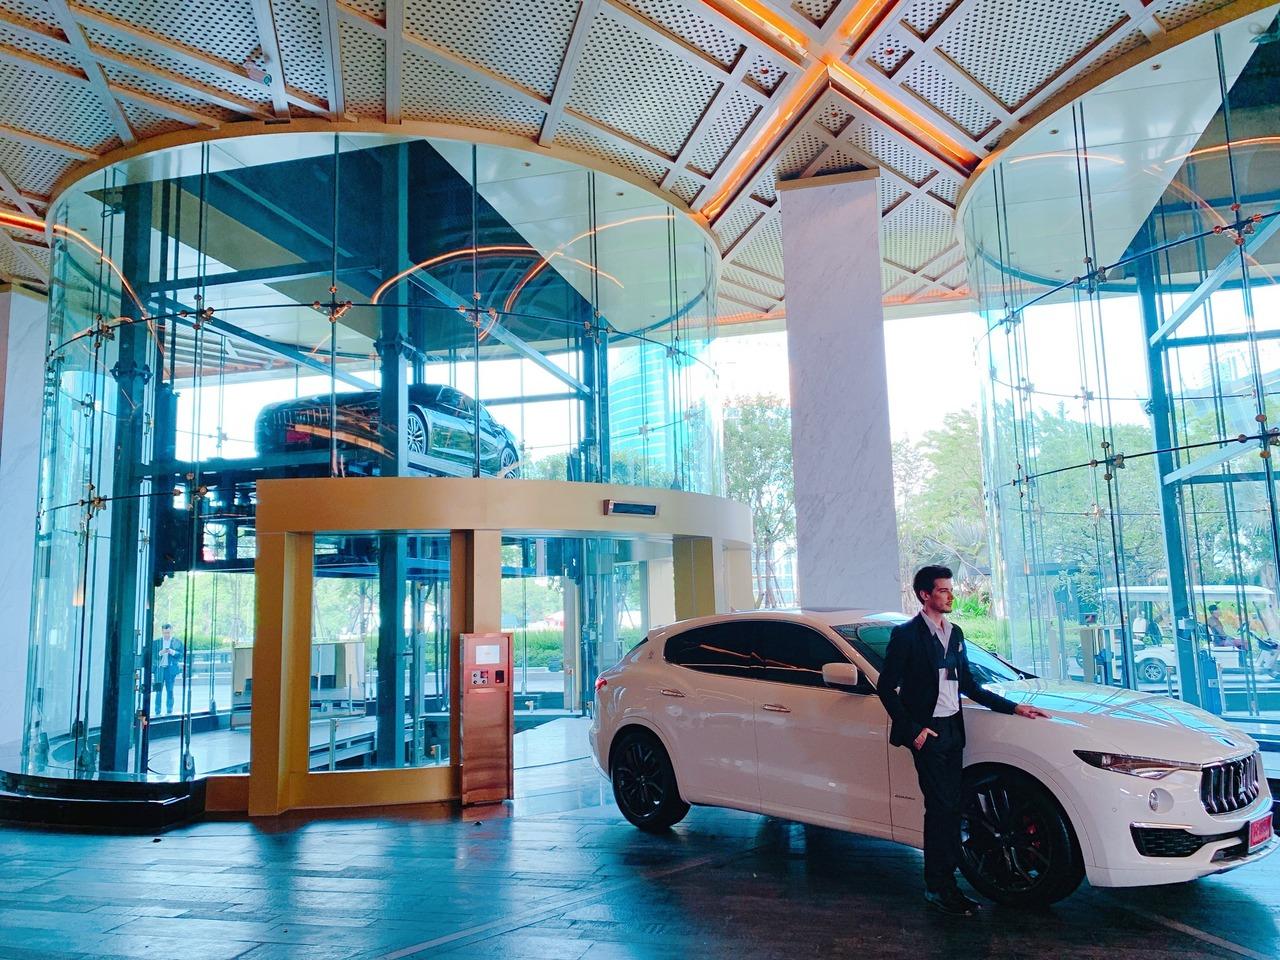 Image result for 泰国最贵酒店式豪宅最高要价5.3亿元